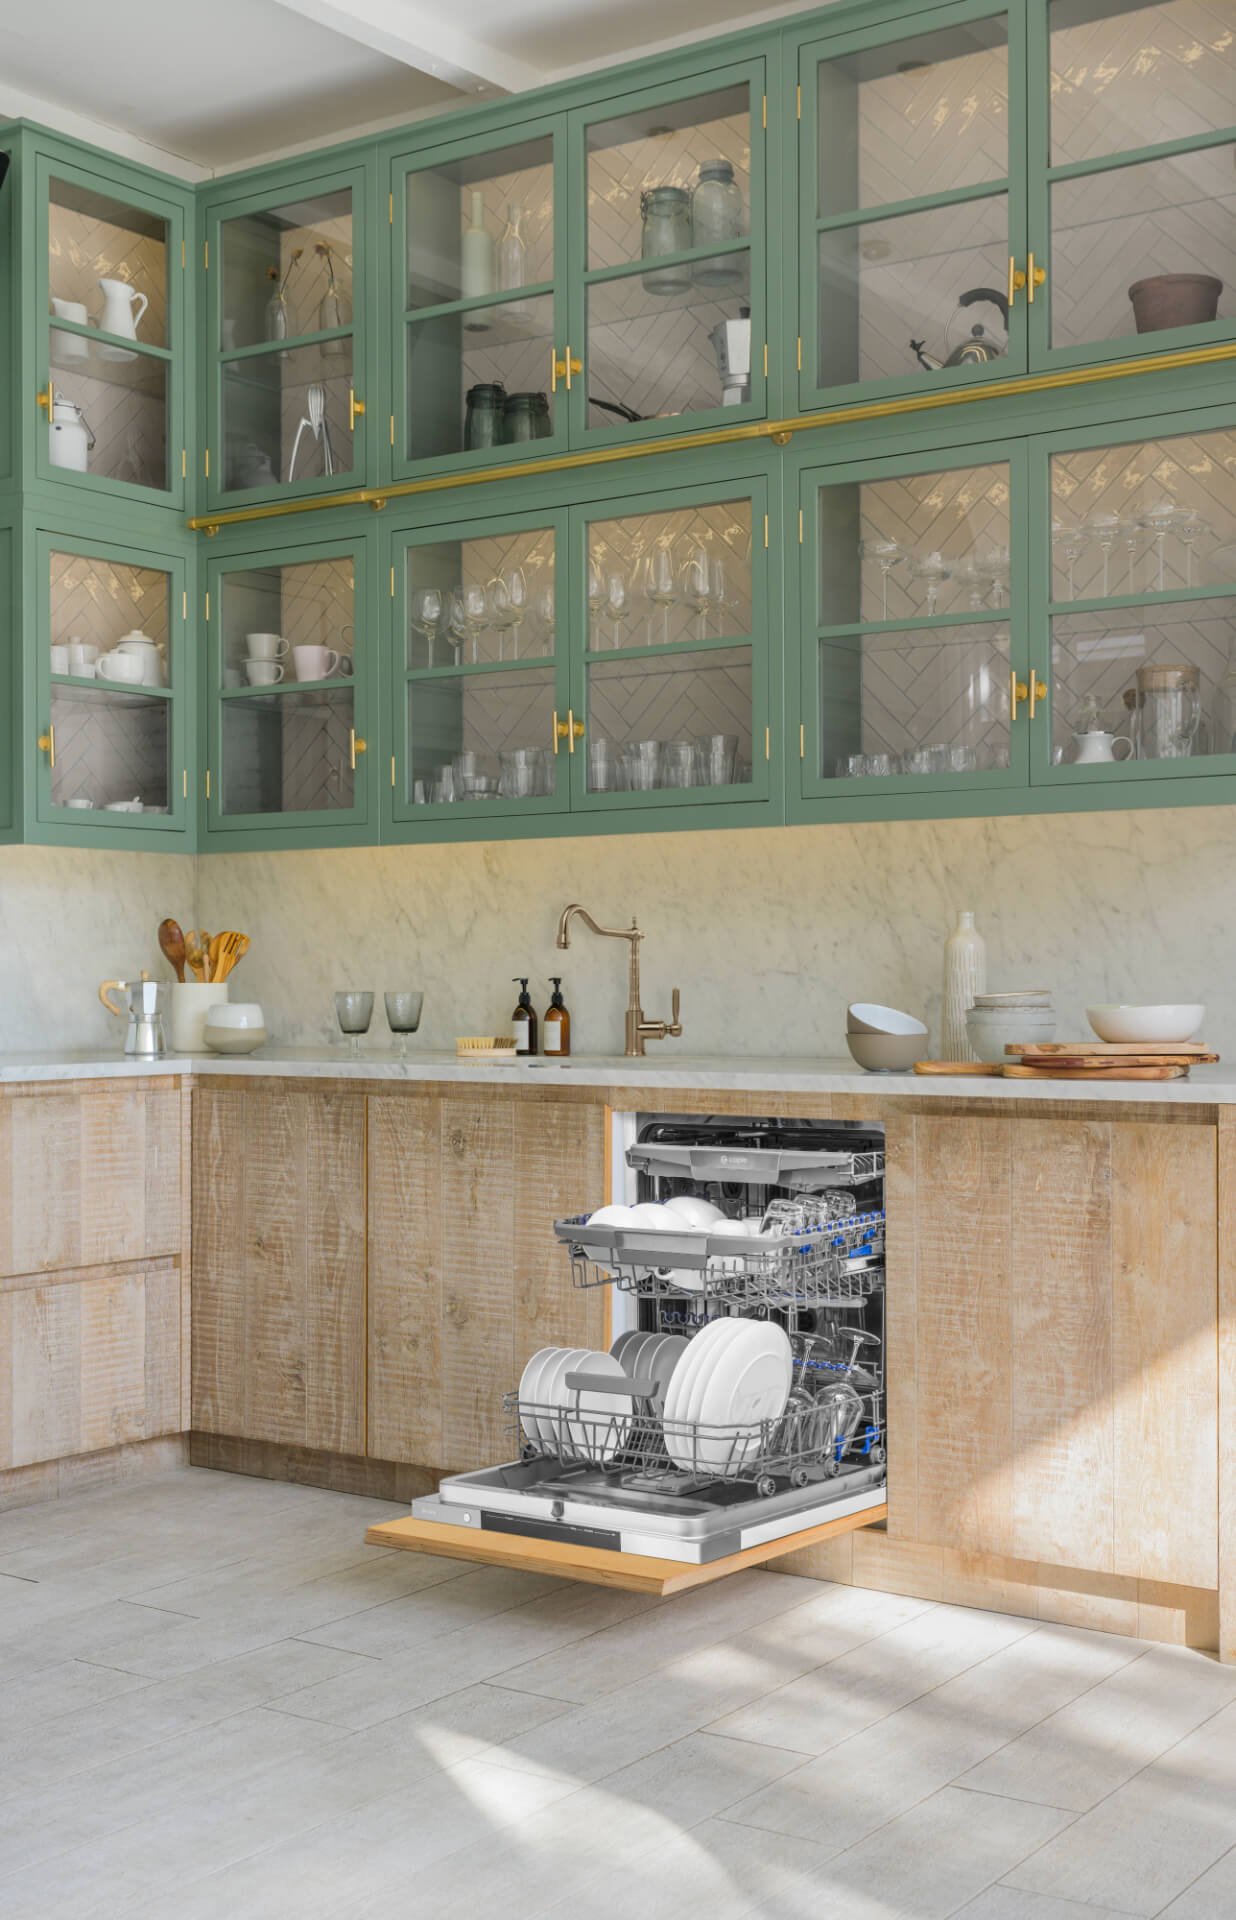 Caple Kitchen Dishwasher